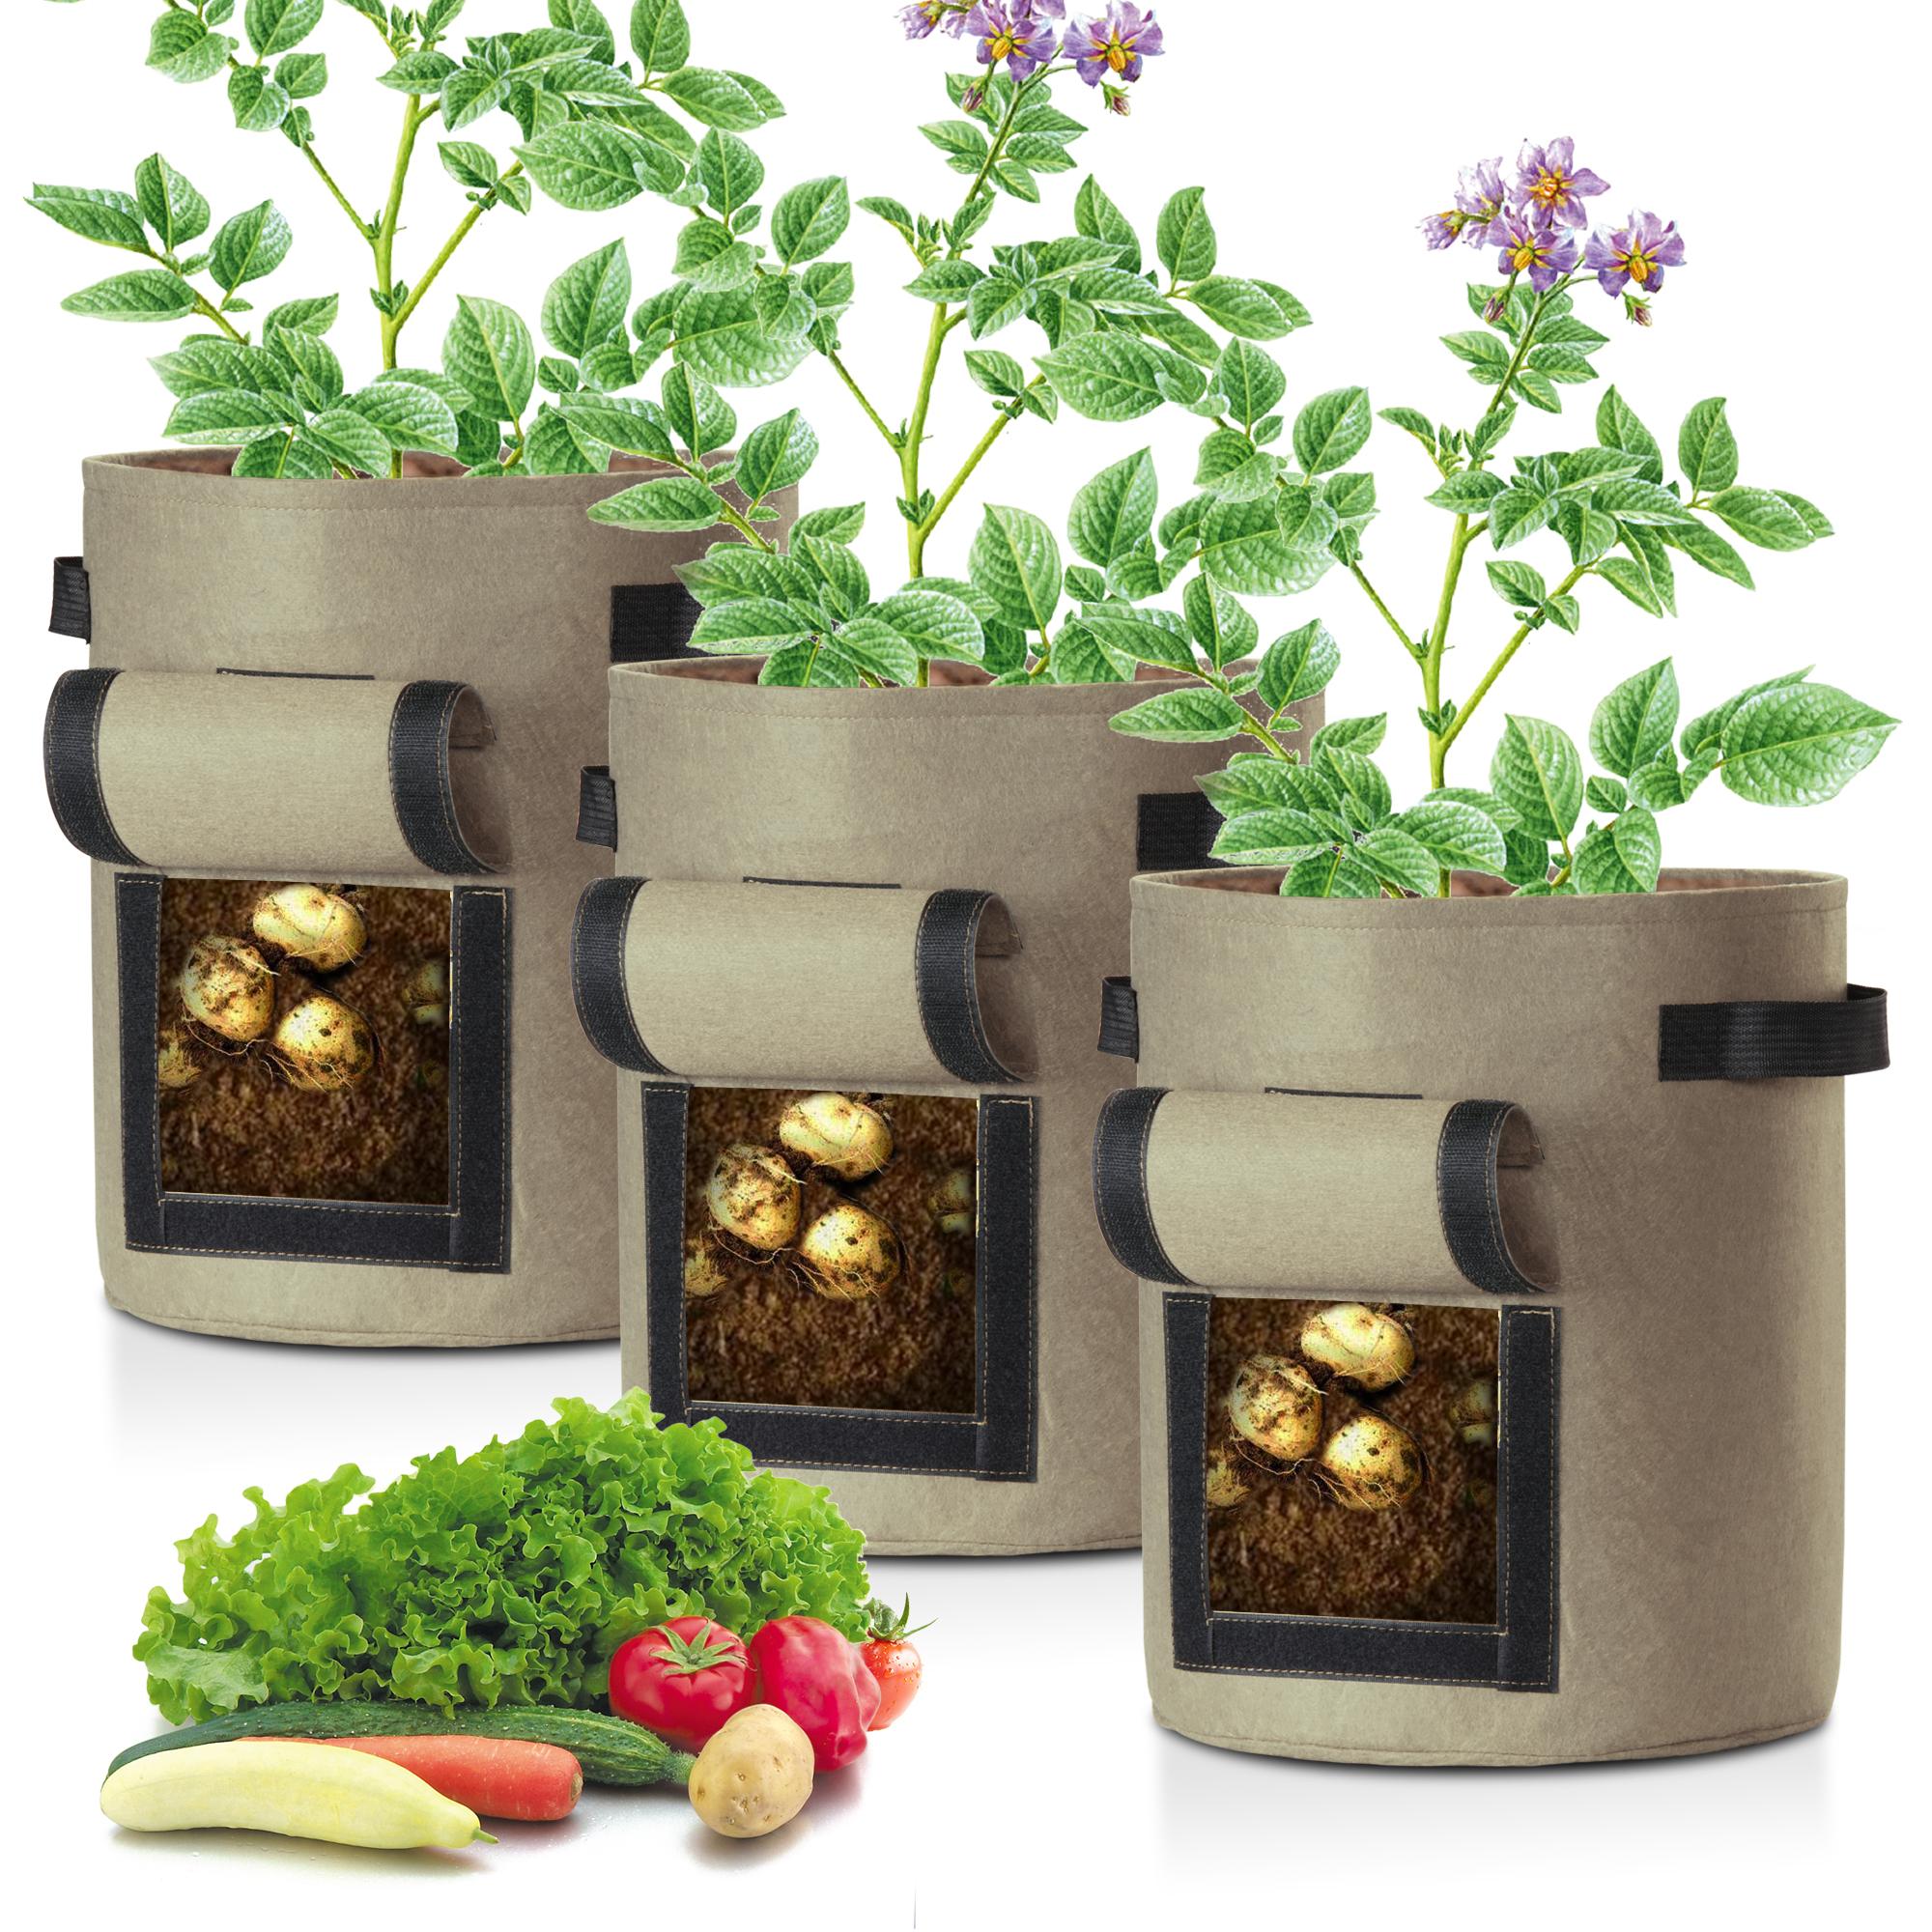 2 Packs LAGarden 5 Gallon Potato Planting Bag Observation Harvest Window Yard